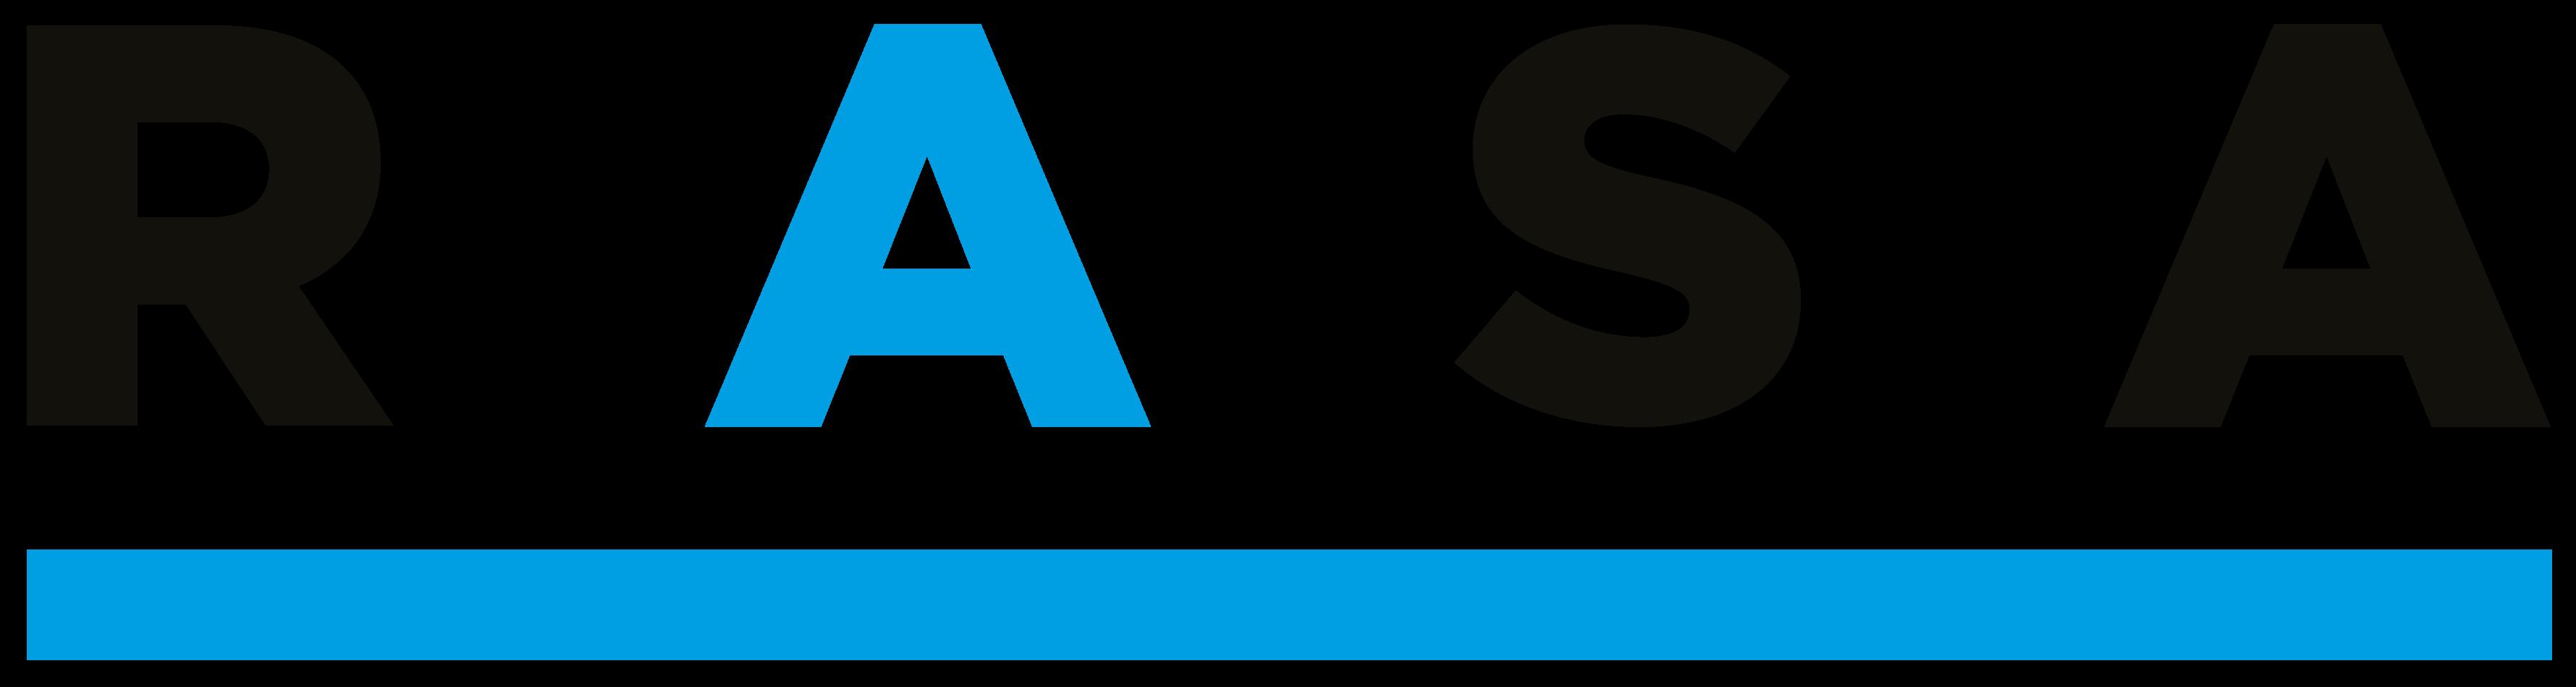 rasa_logo (1) 1